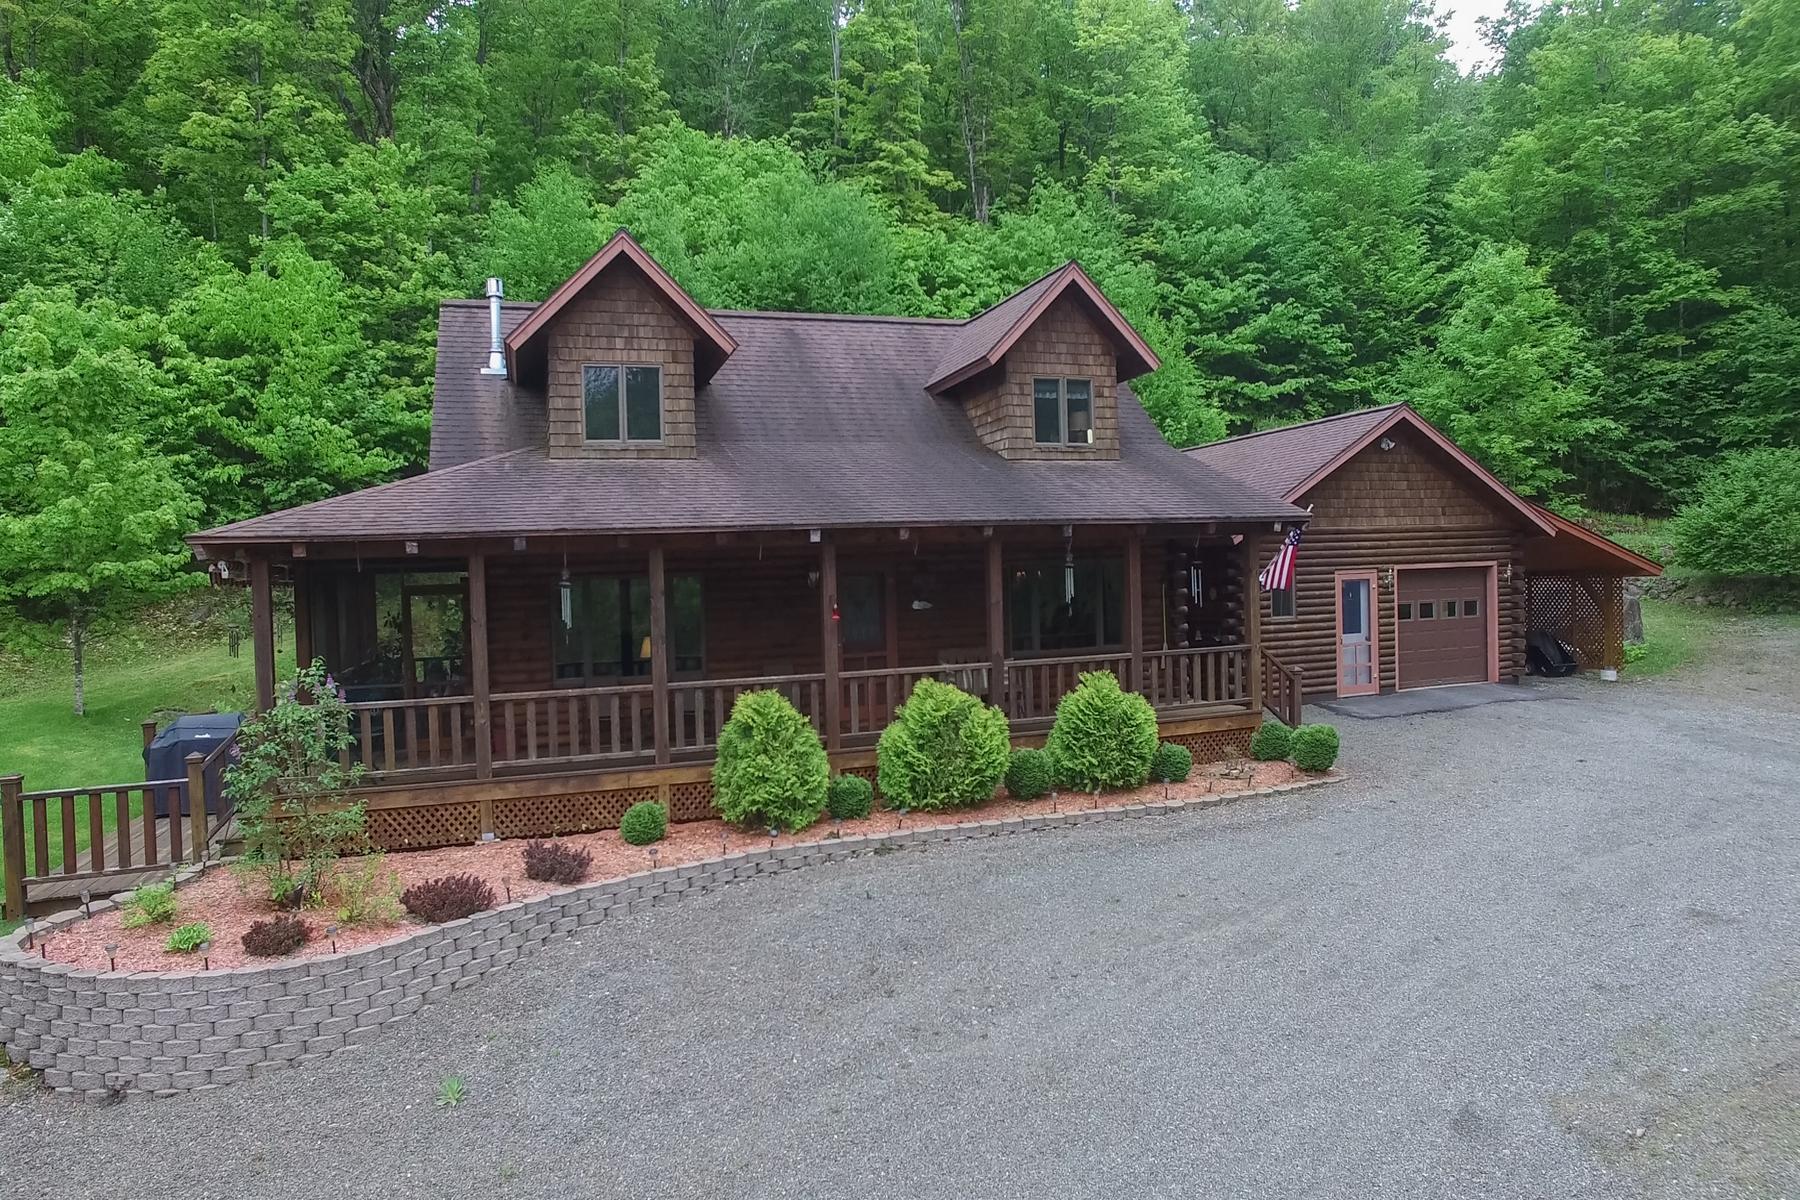 独户住宅 为 销售 在 Charming Adirondack Log Cabin 385 County Rte 45 塔伯湖, 纽约州 12982 美国